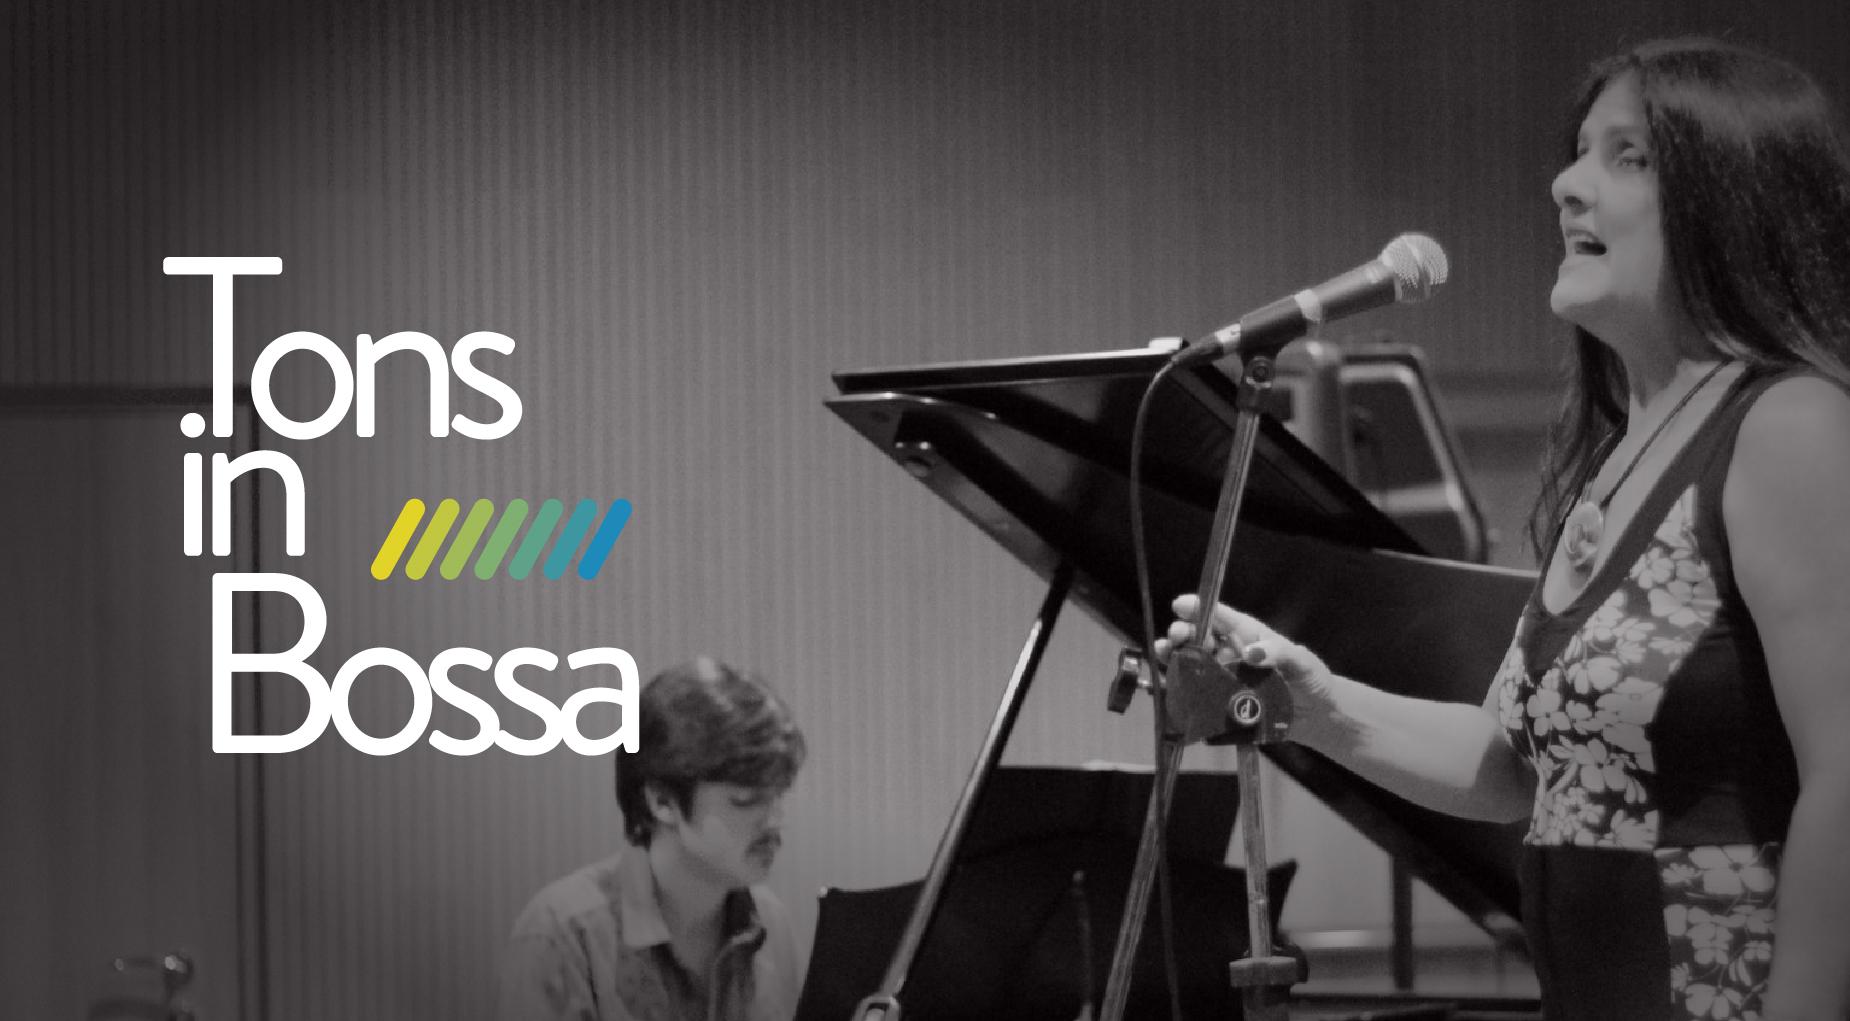 03/08 - tons in bossa: agenda cordas